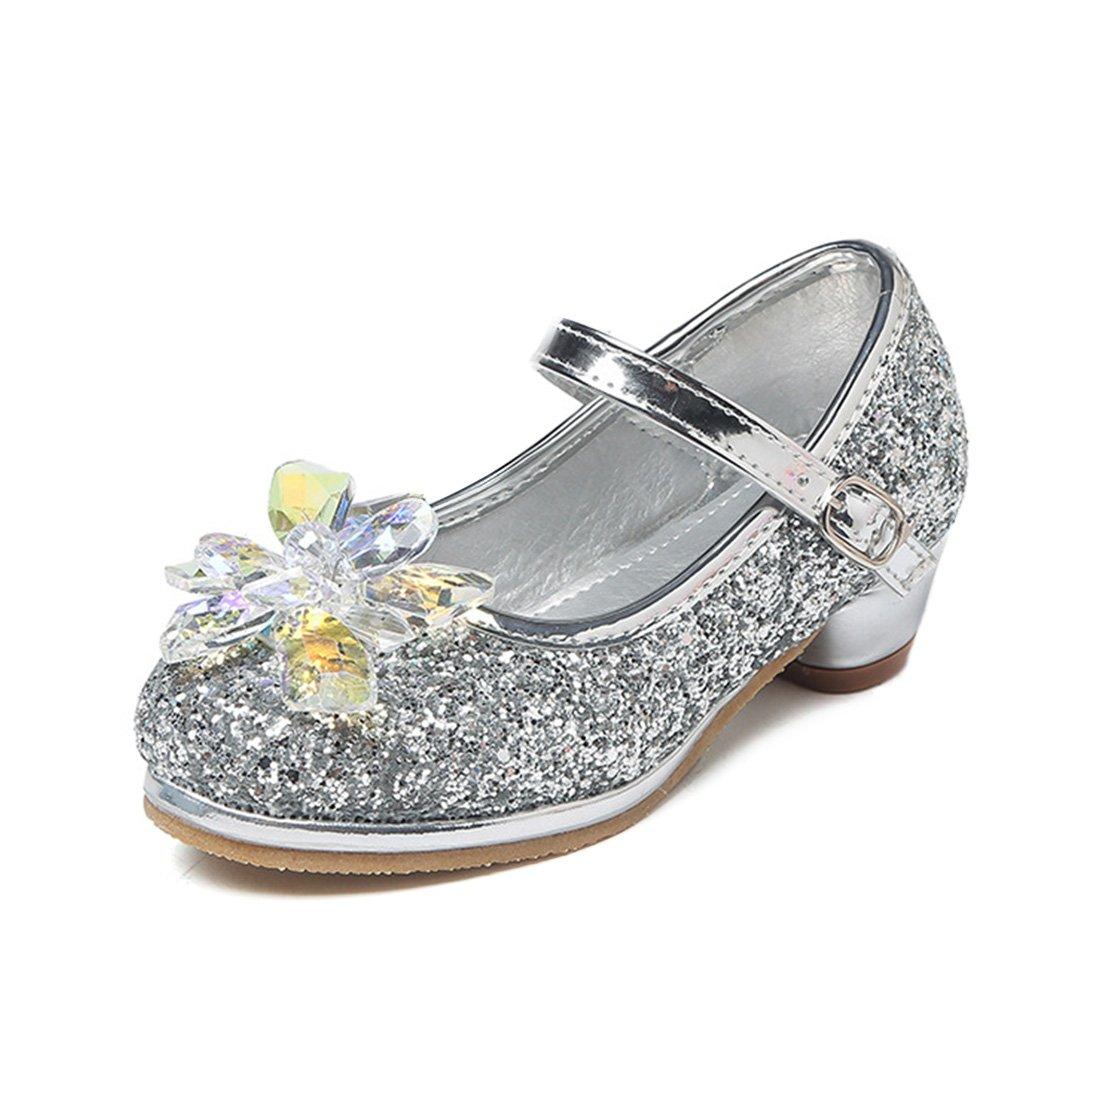 YIBLBOX Girls Kids Toddler Dress up Wedding Cosplay Princess Shoes Glitter Crystal Mary Jane Low Heel Shoes